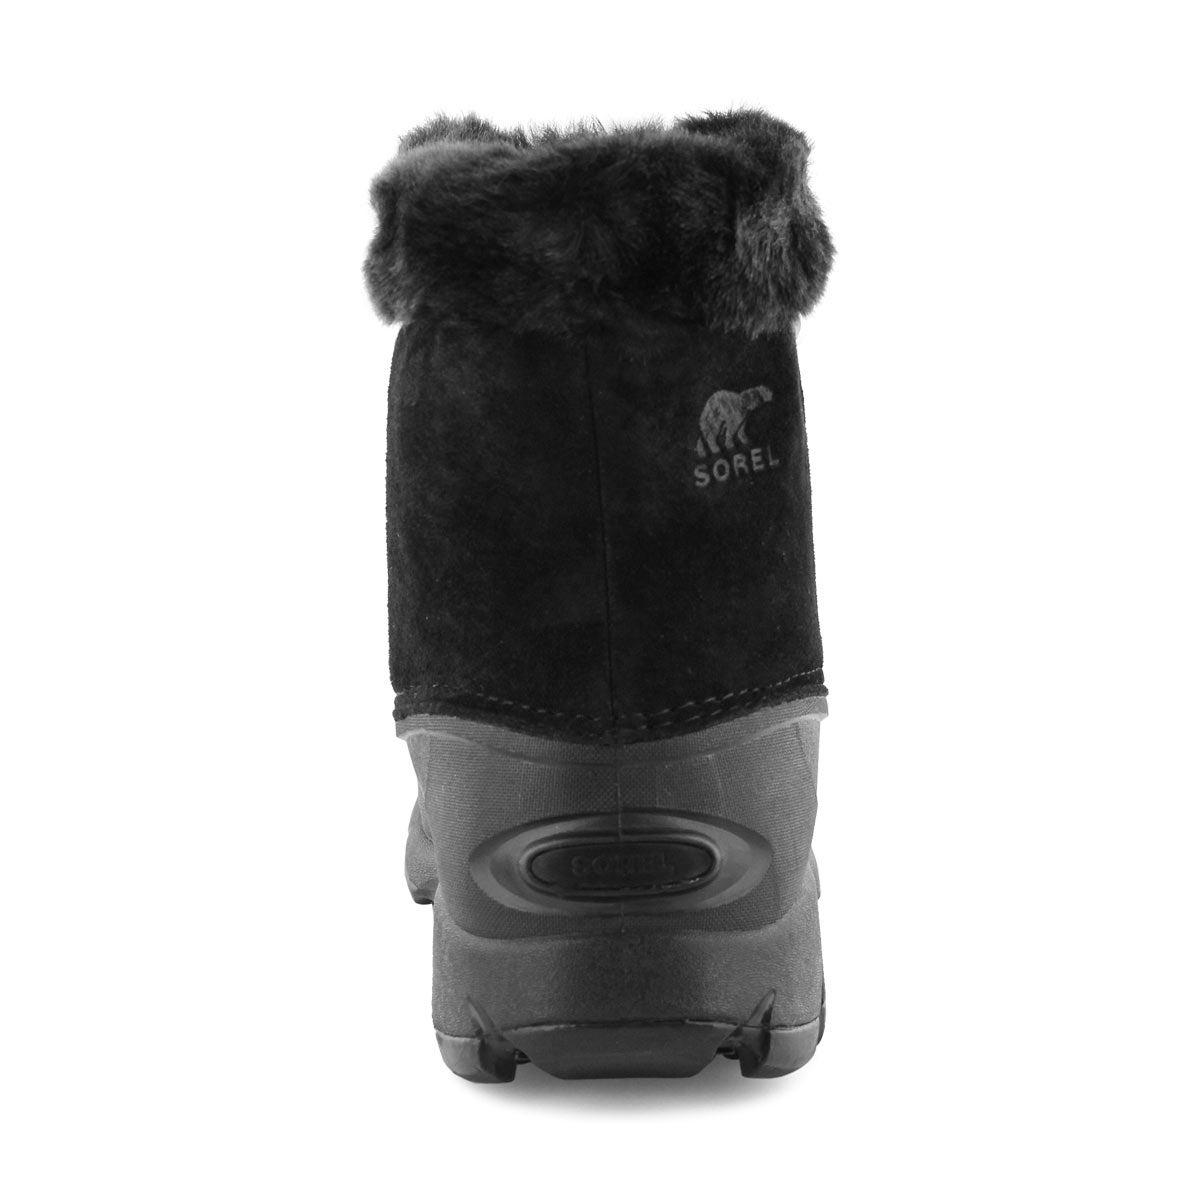 Lds Snow Angel DTV blk wtpf winter boot